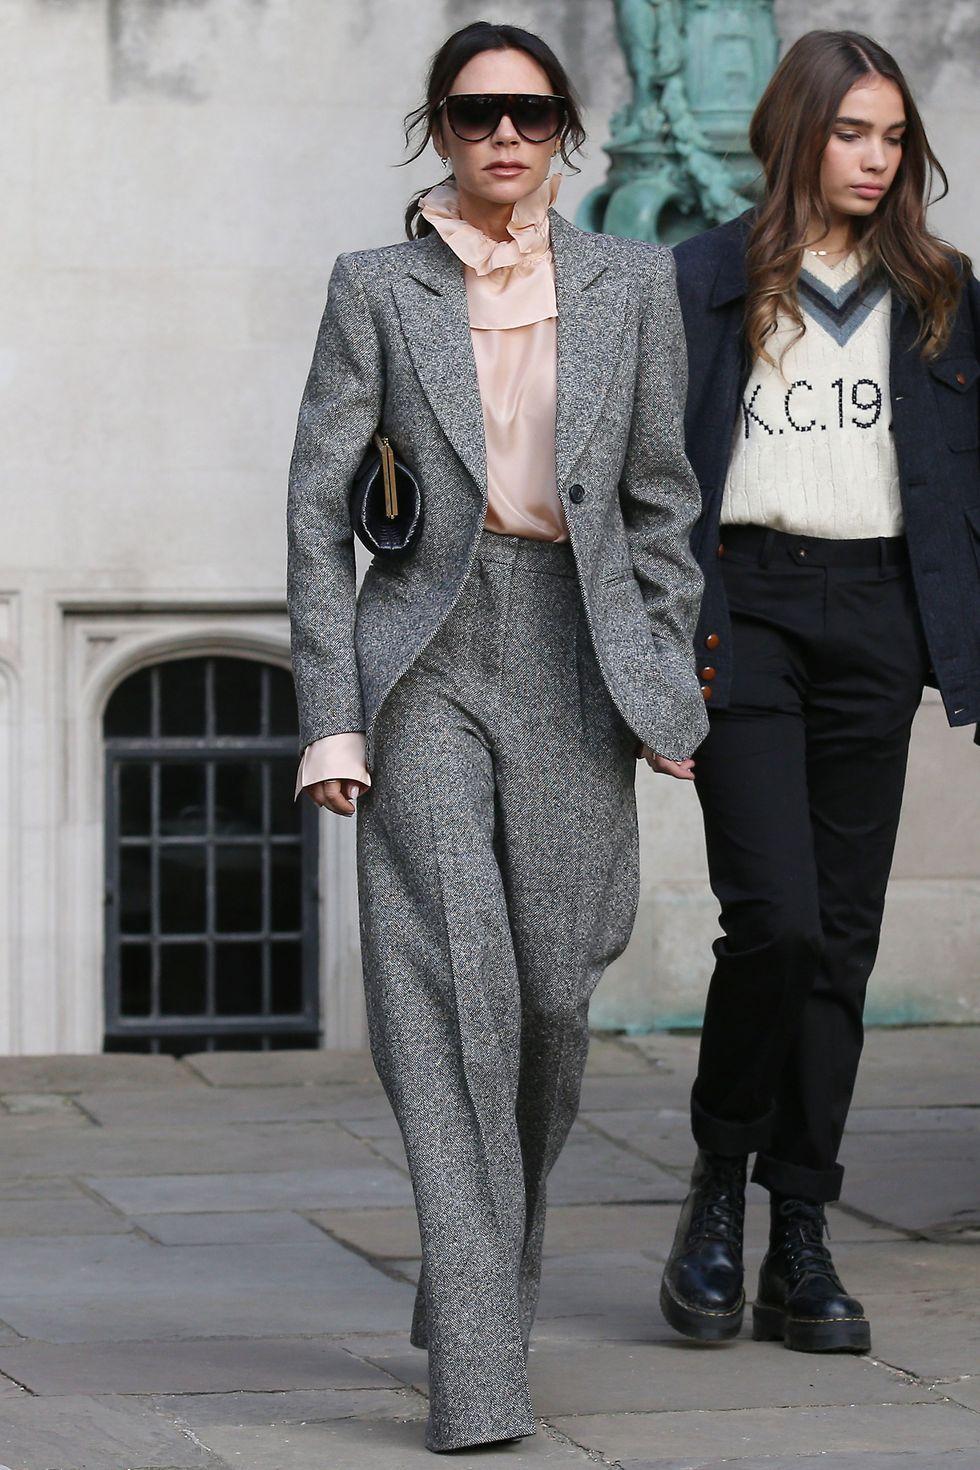 Victoria Beckham wearing a suit